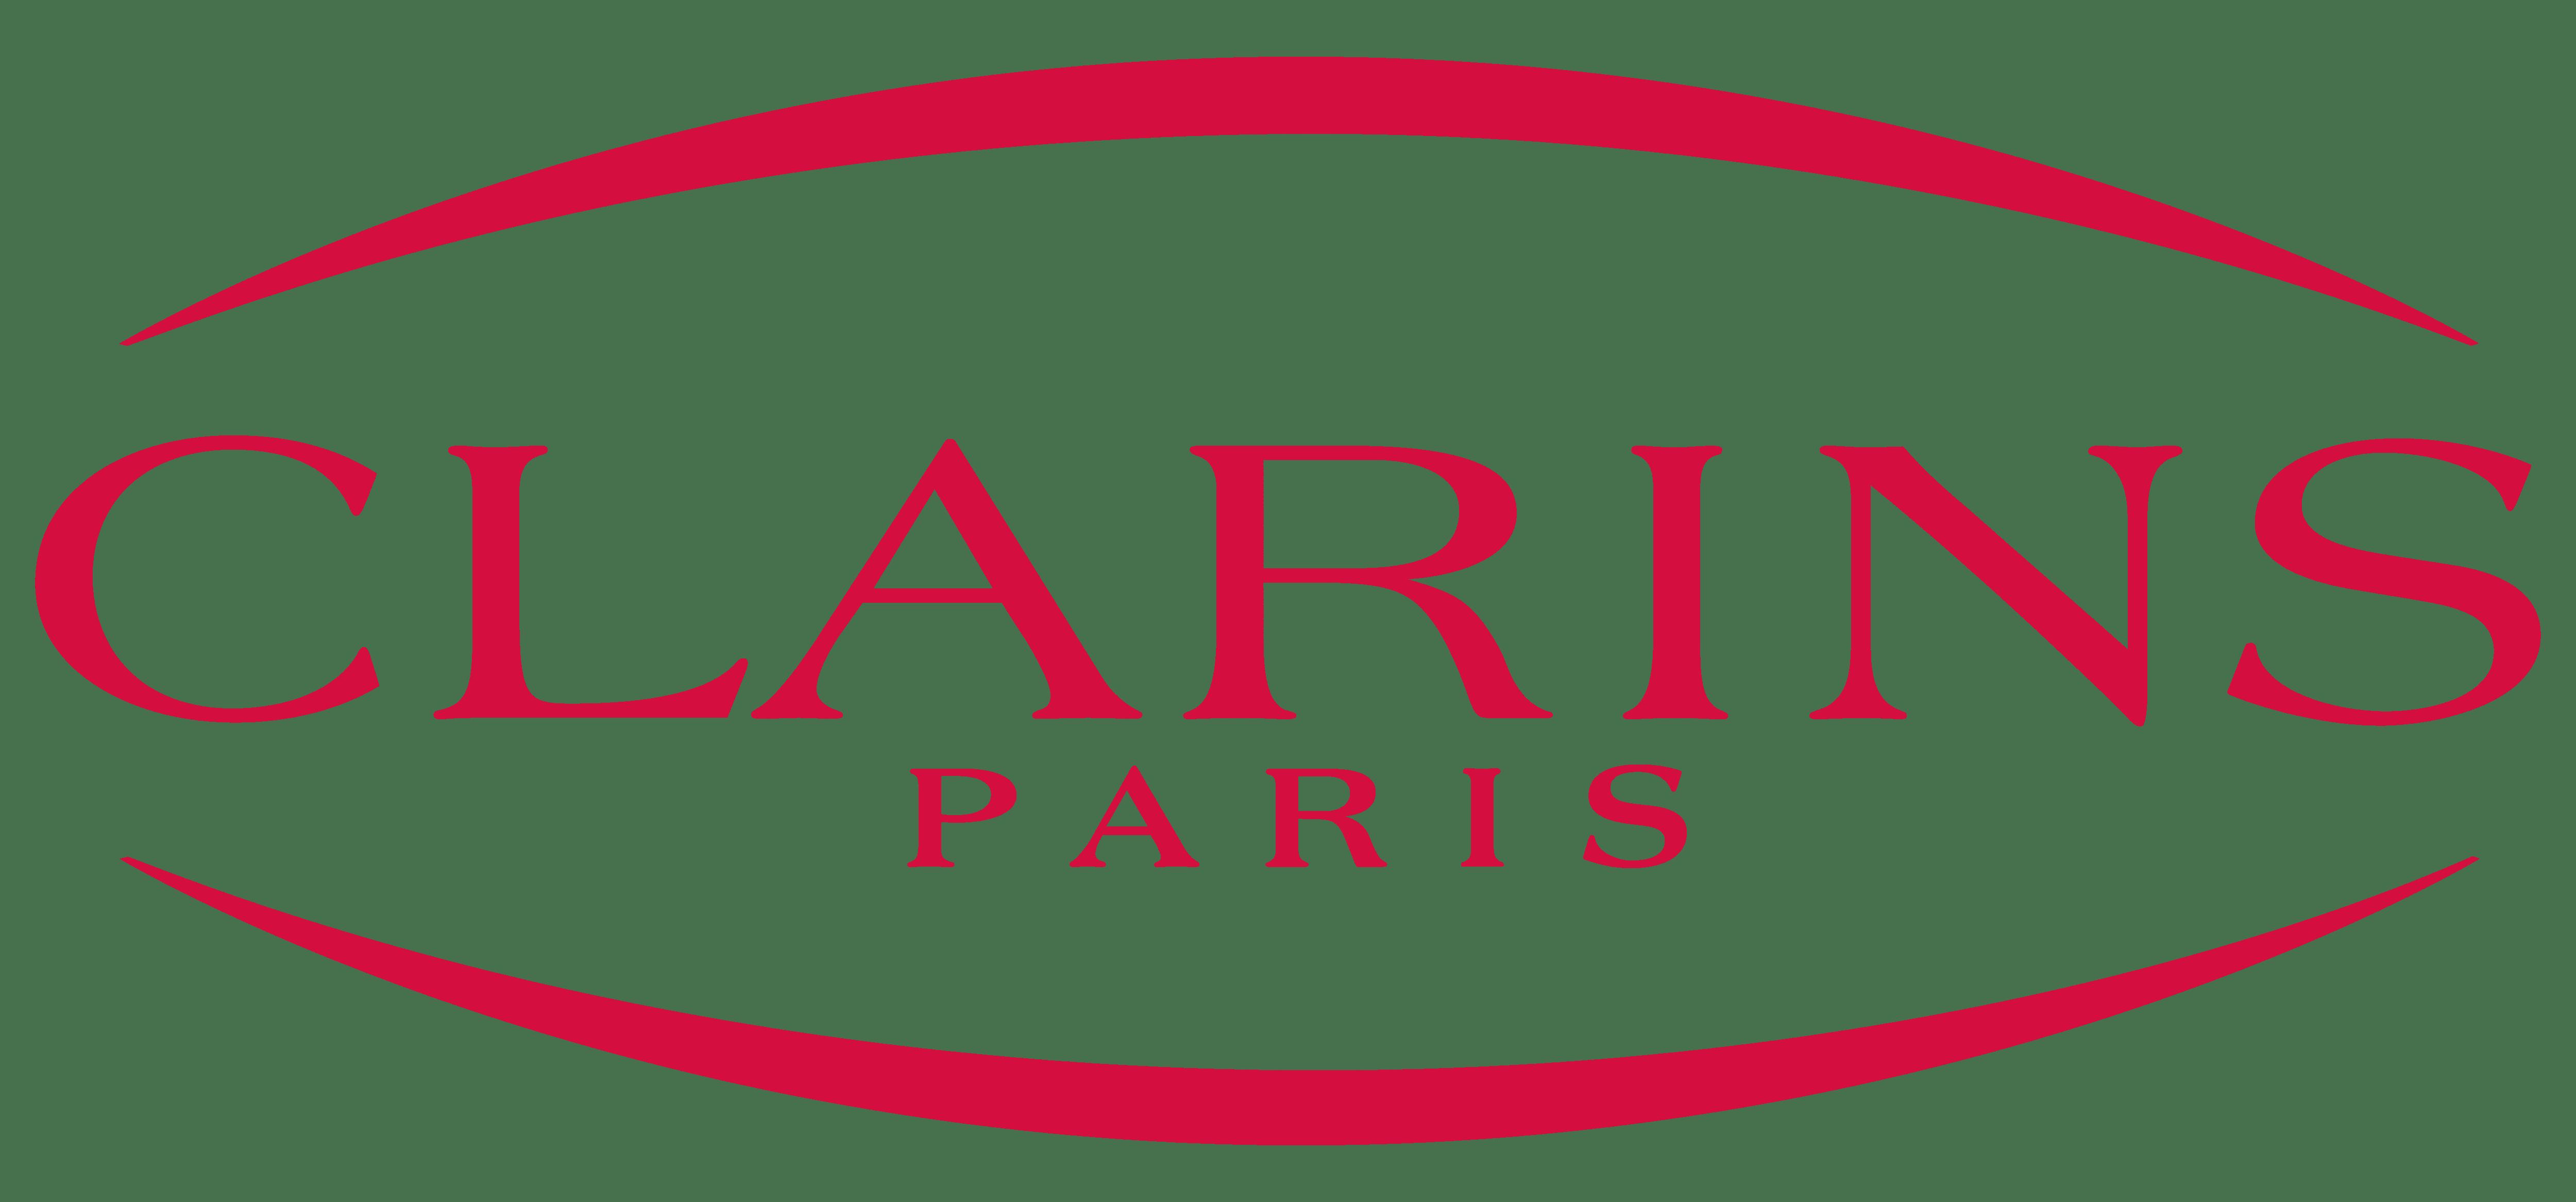 Clarins student discounts logo